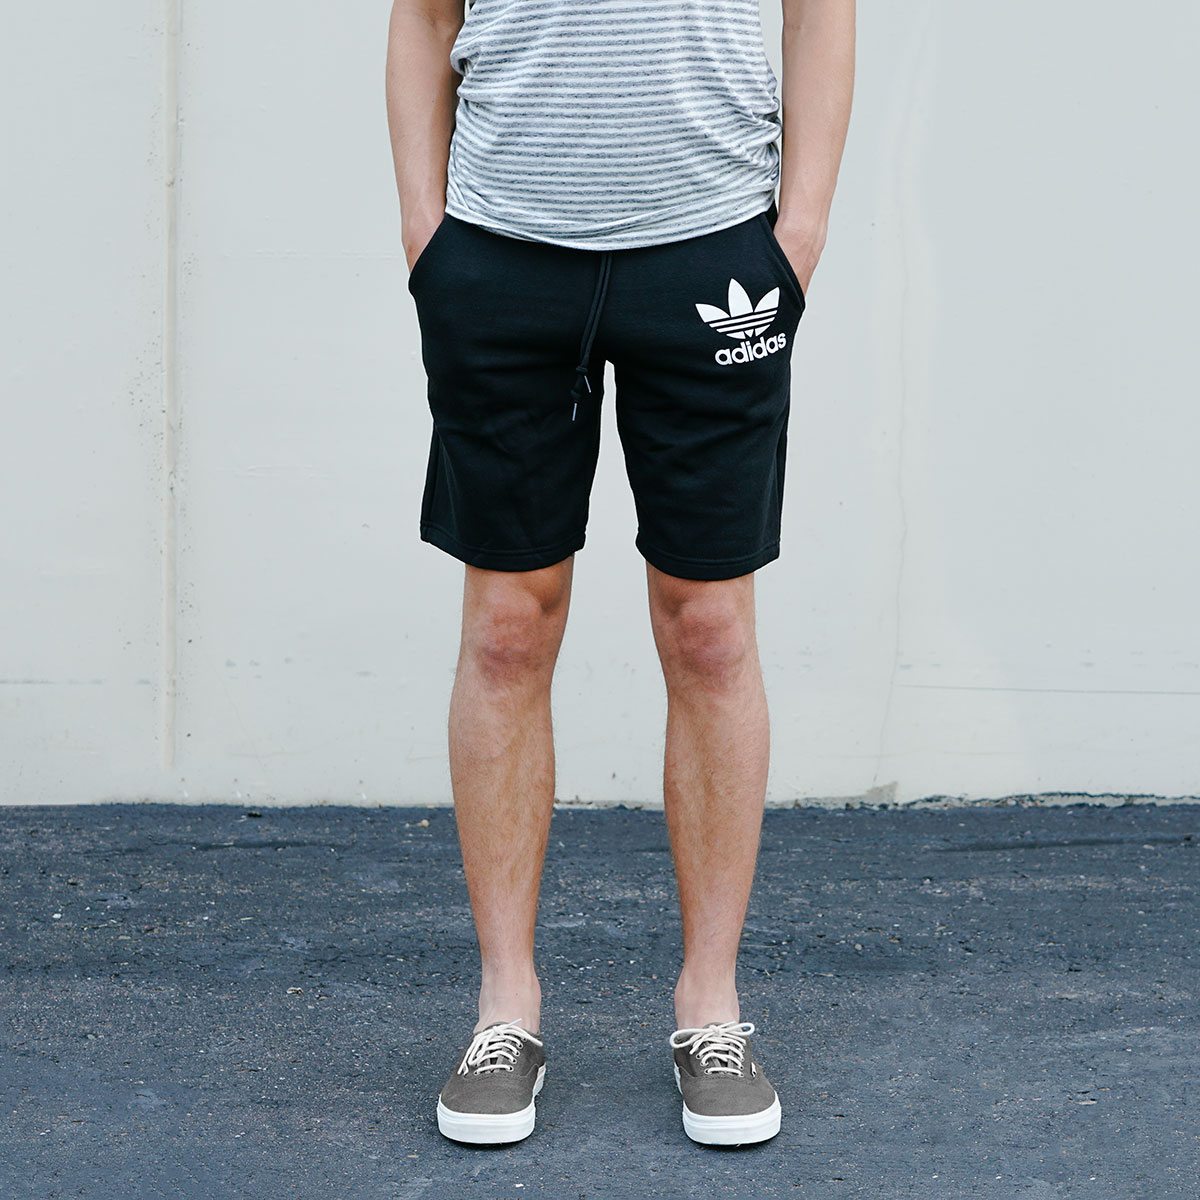 adidas-Men-039-s-ADC-F-Trefoil-Shorts